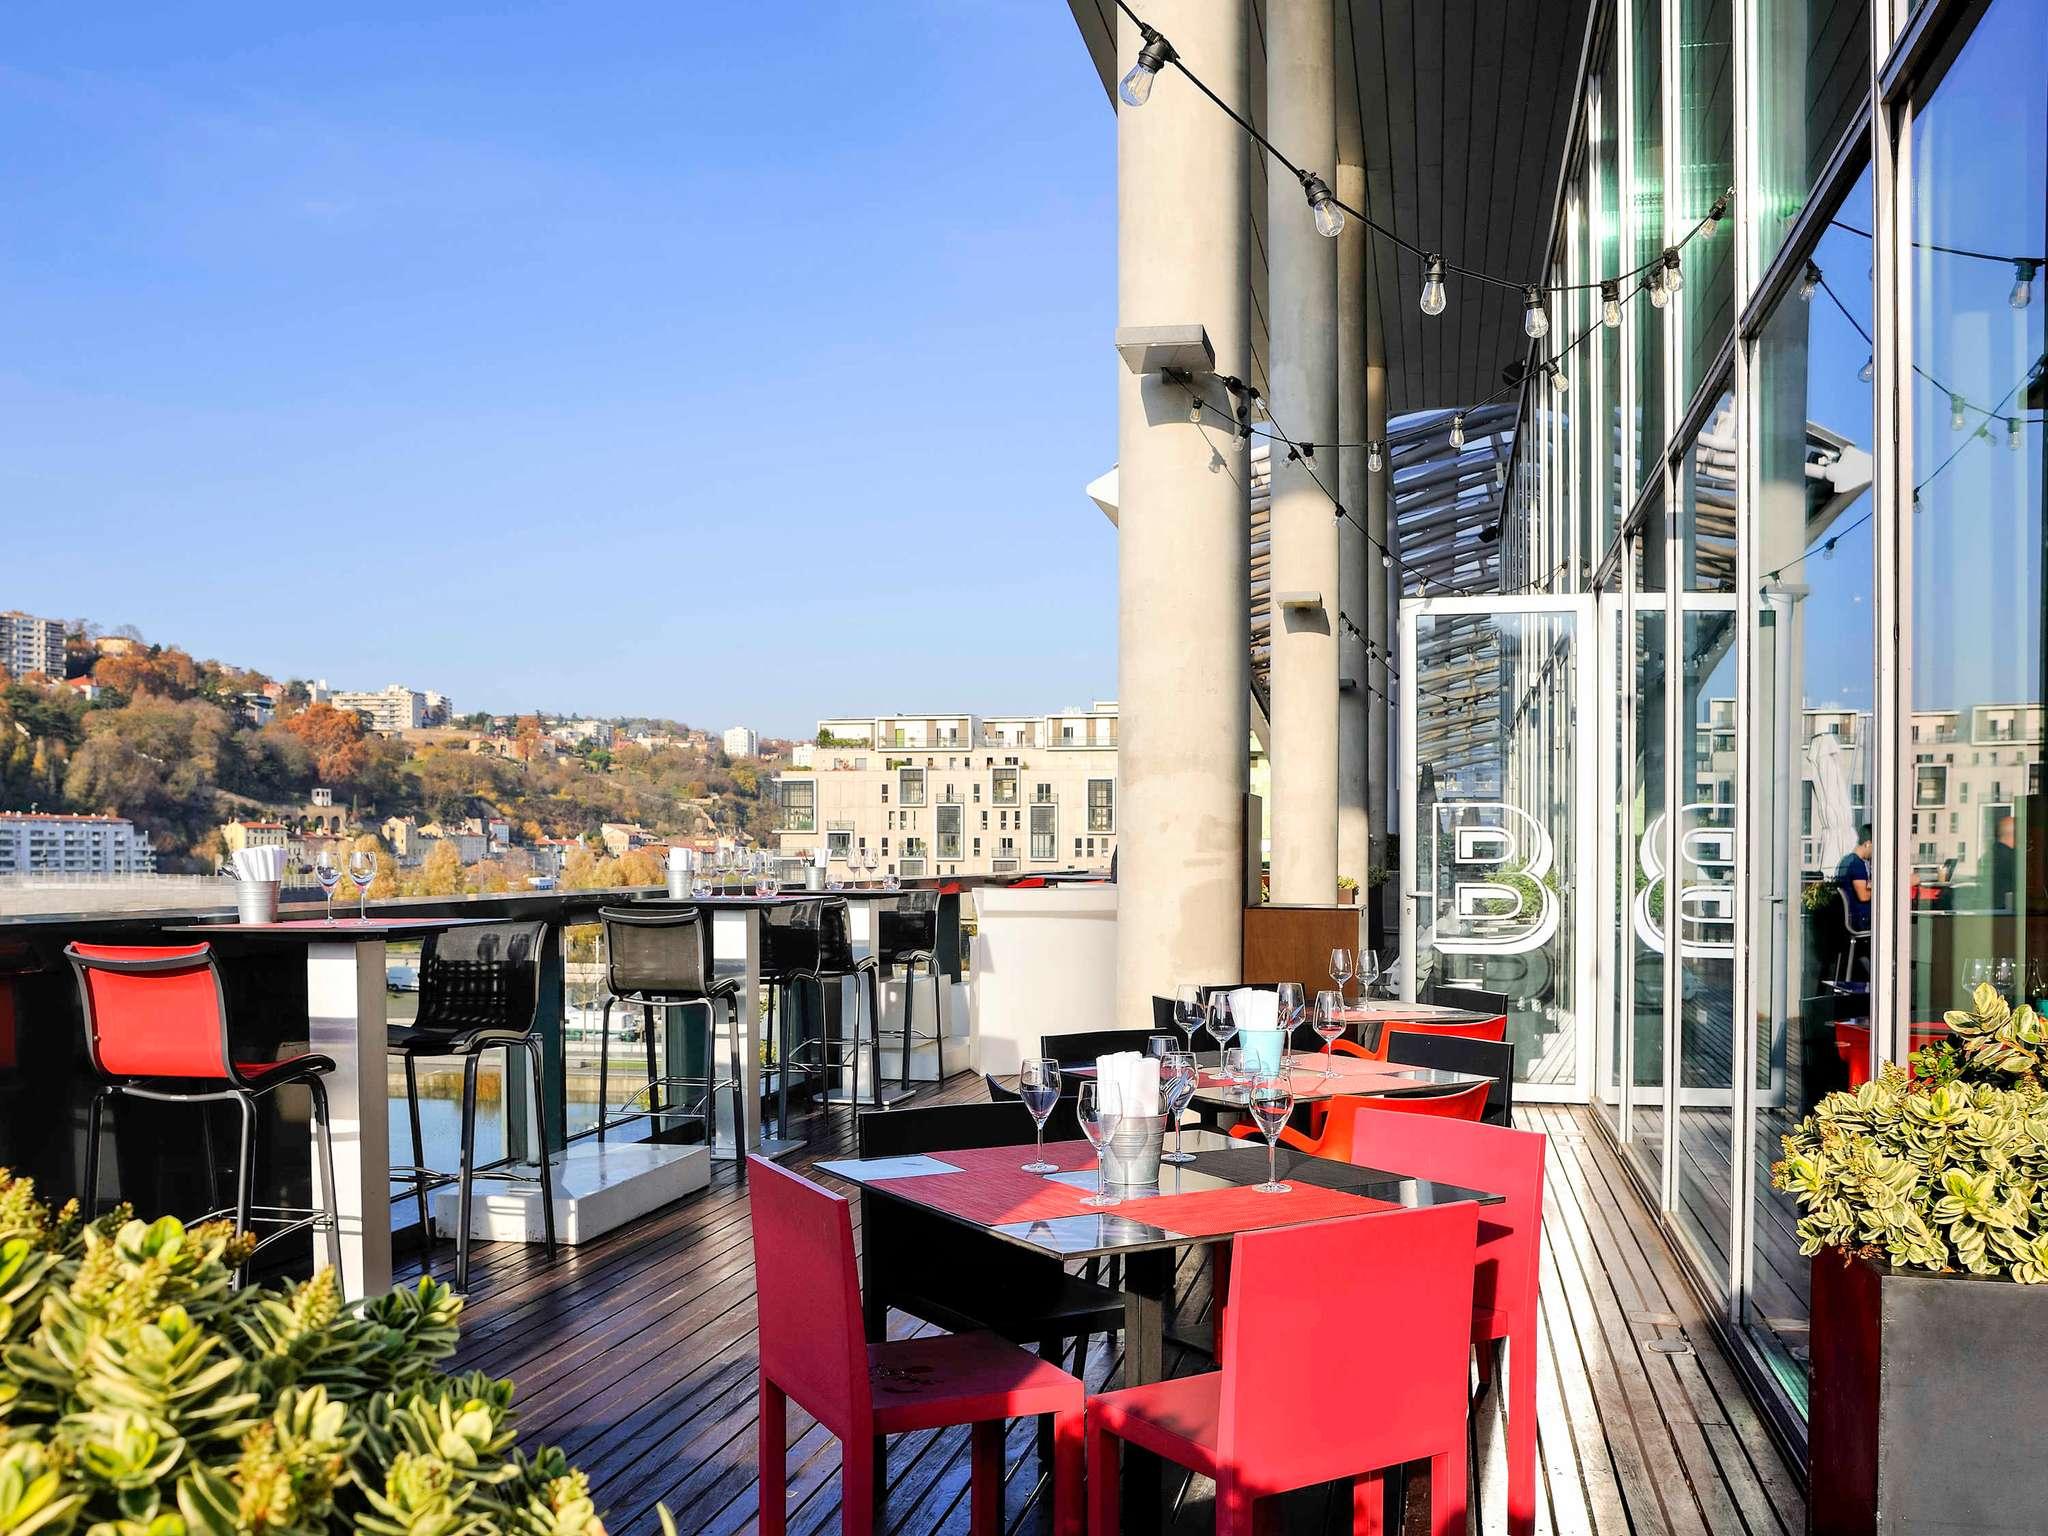 Hotel – Novotel Lyon Confluence